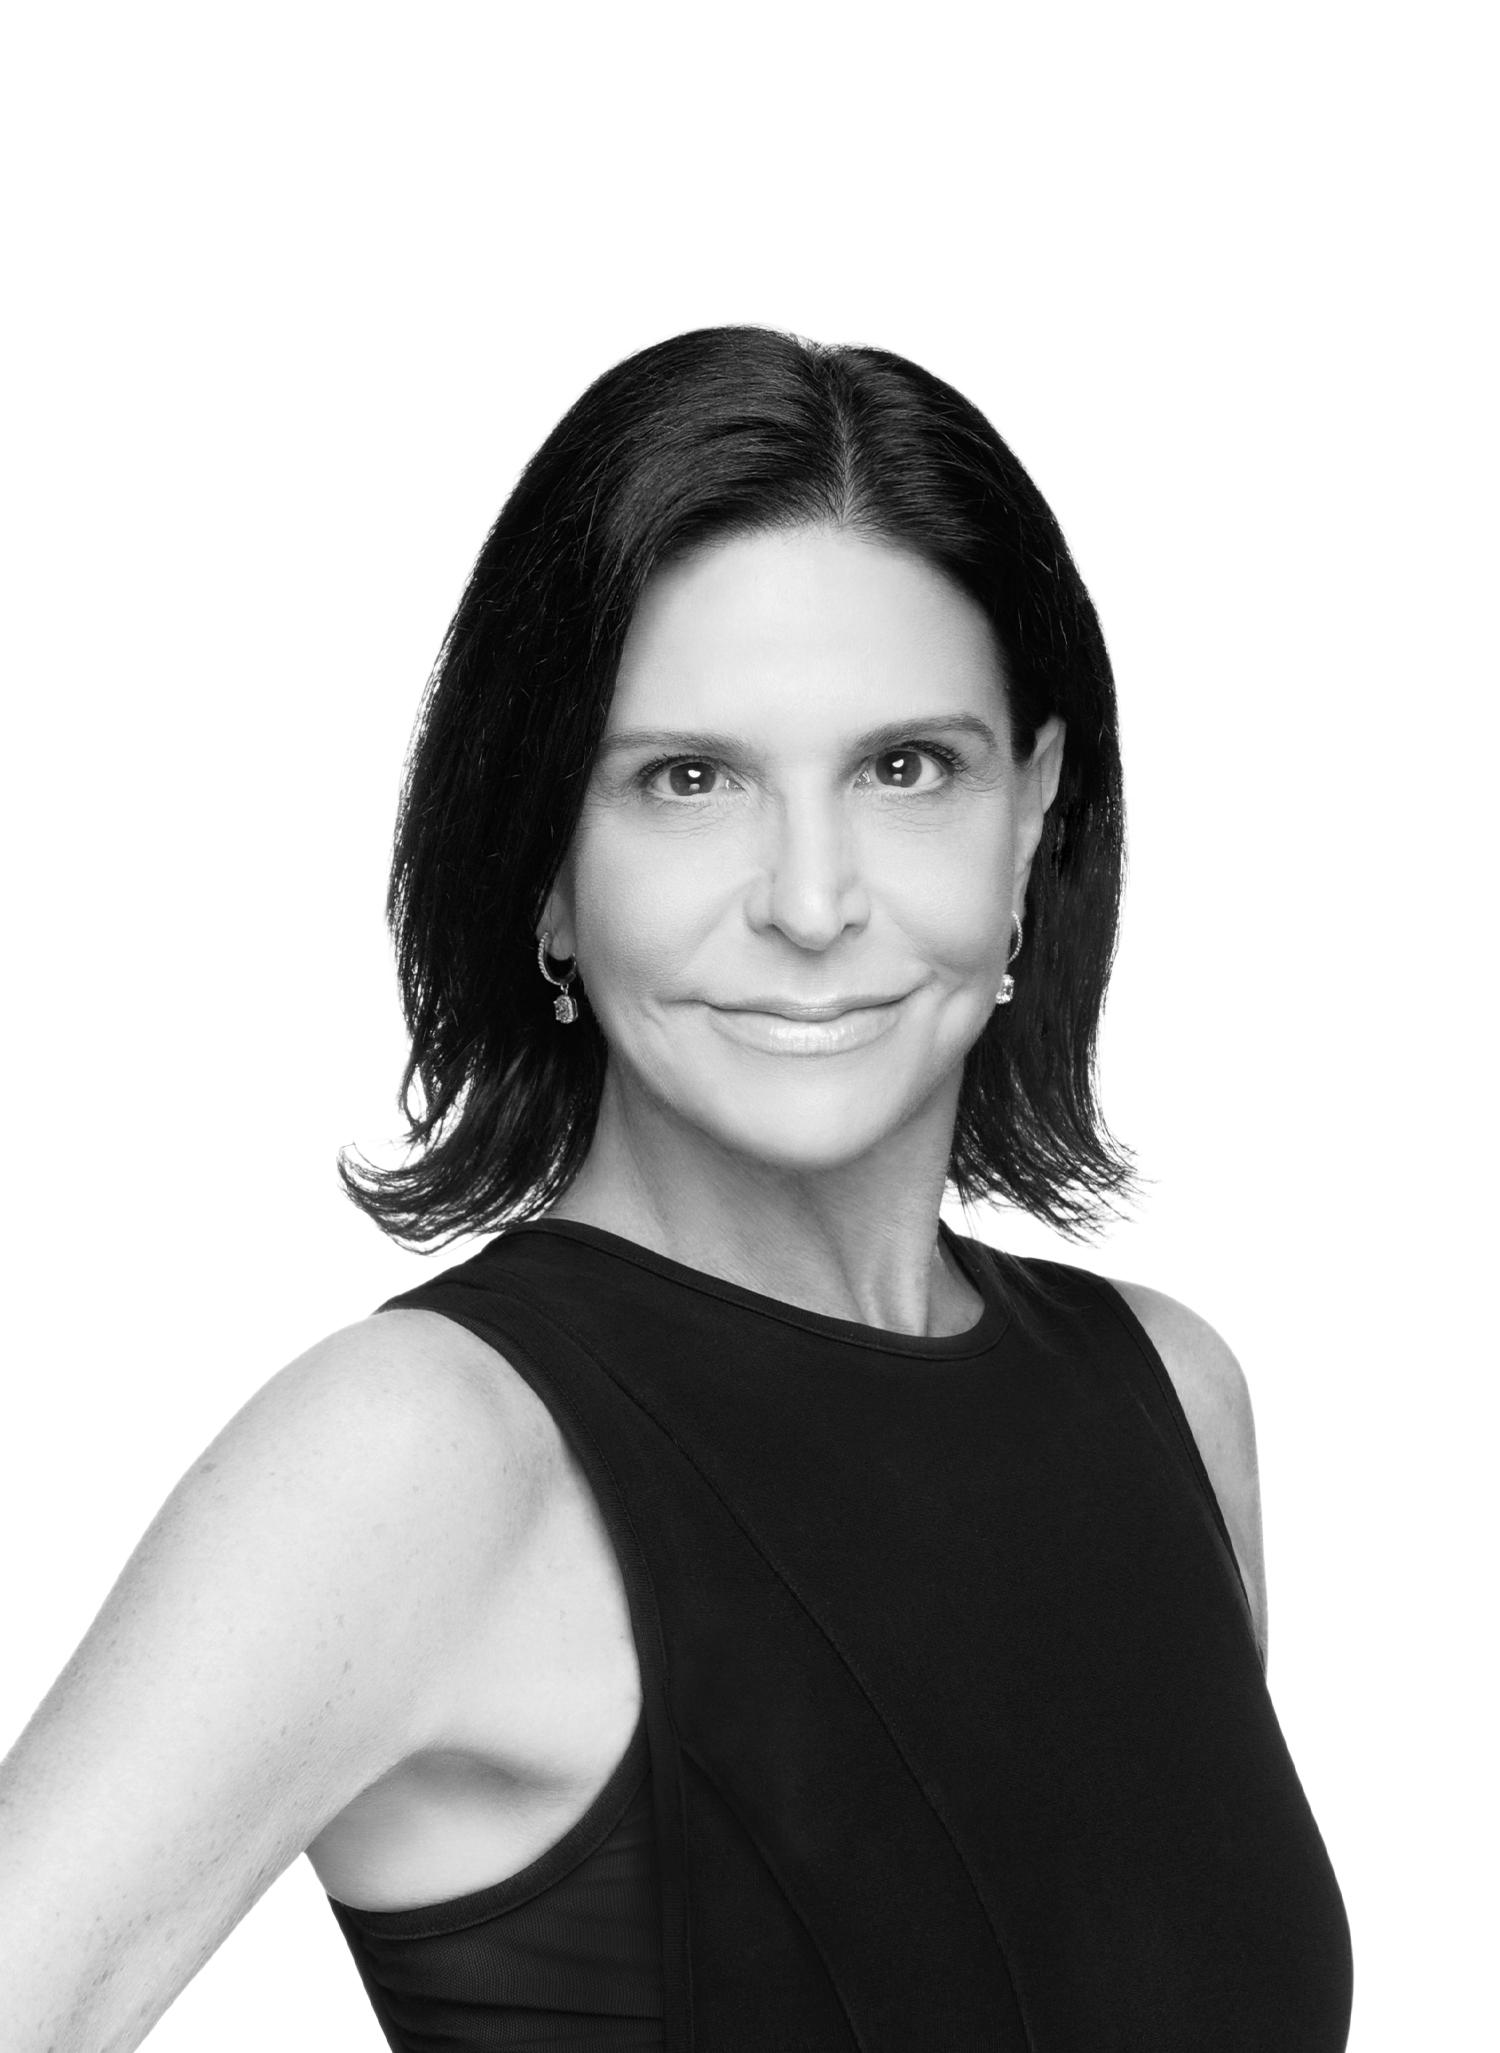 Jill Meyerson Barzilay